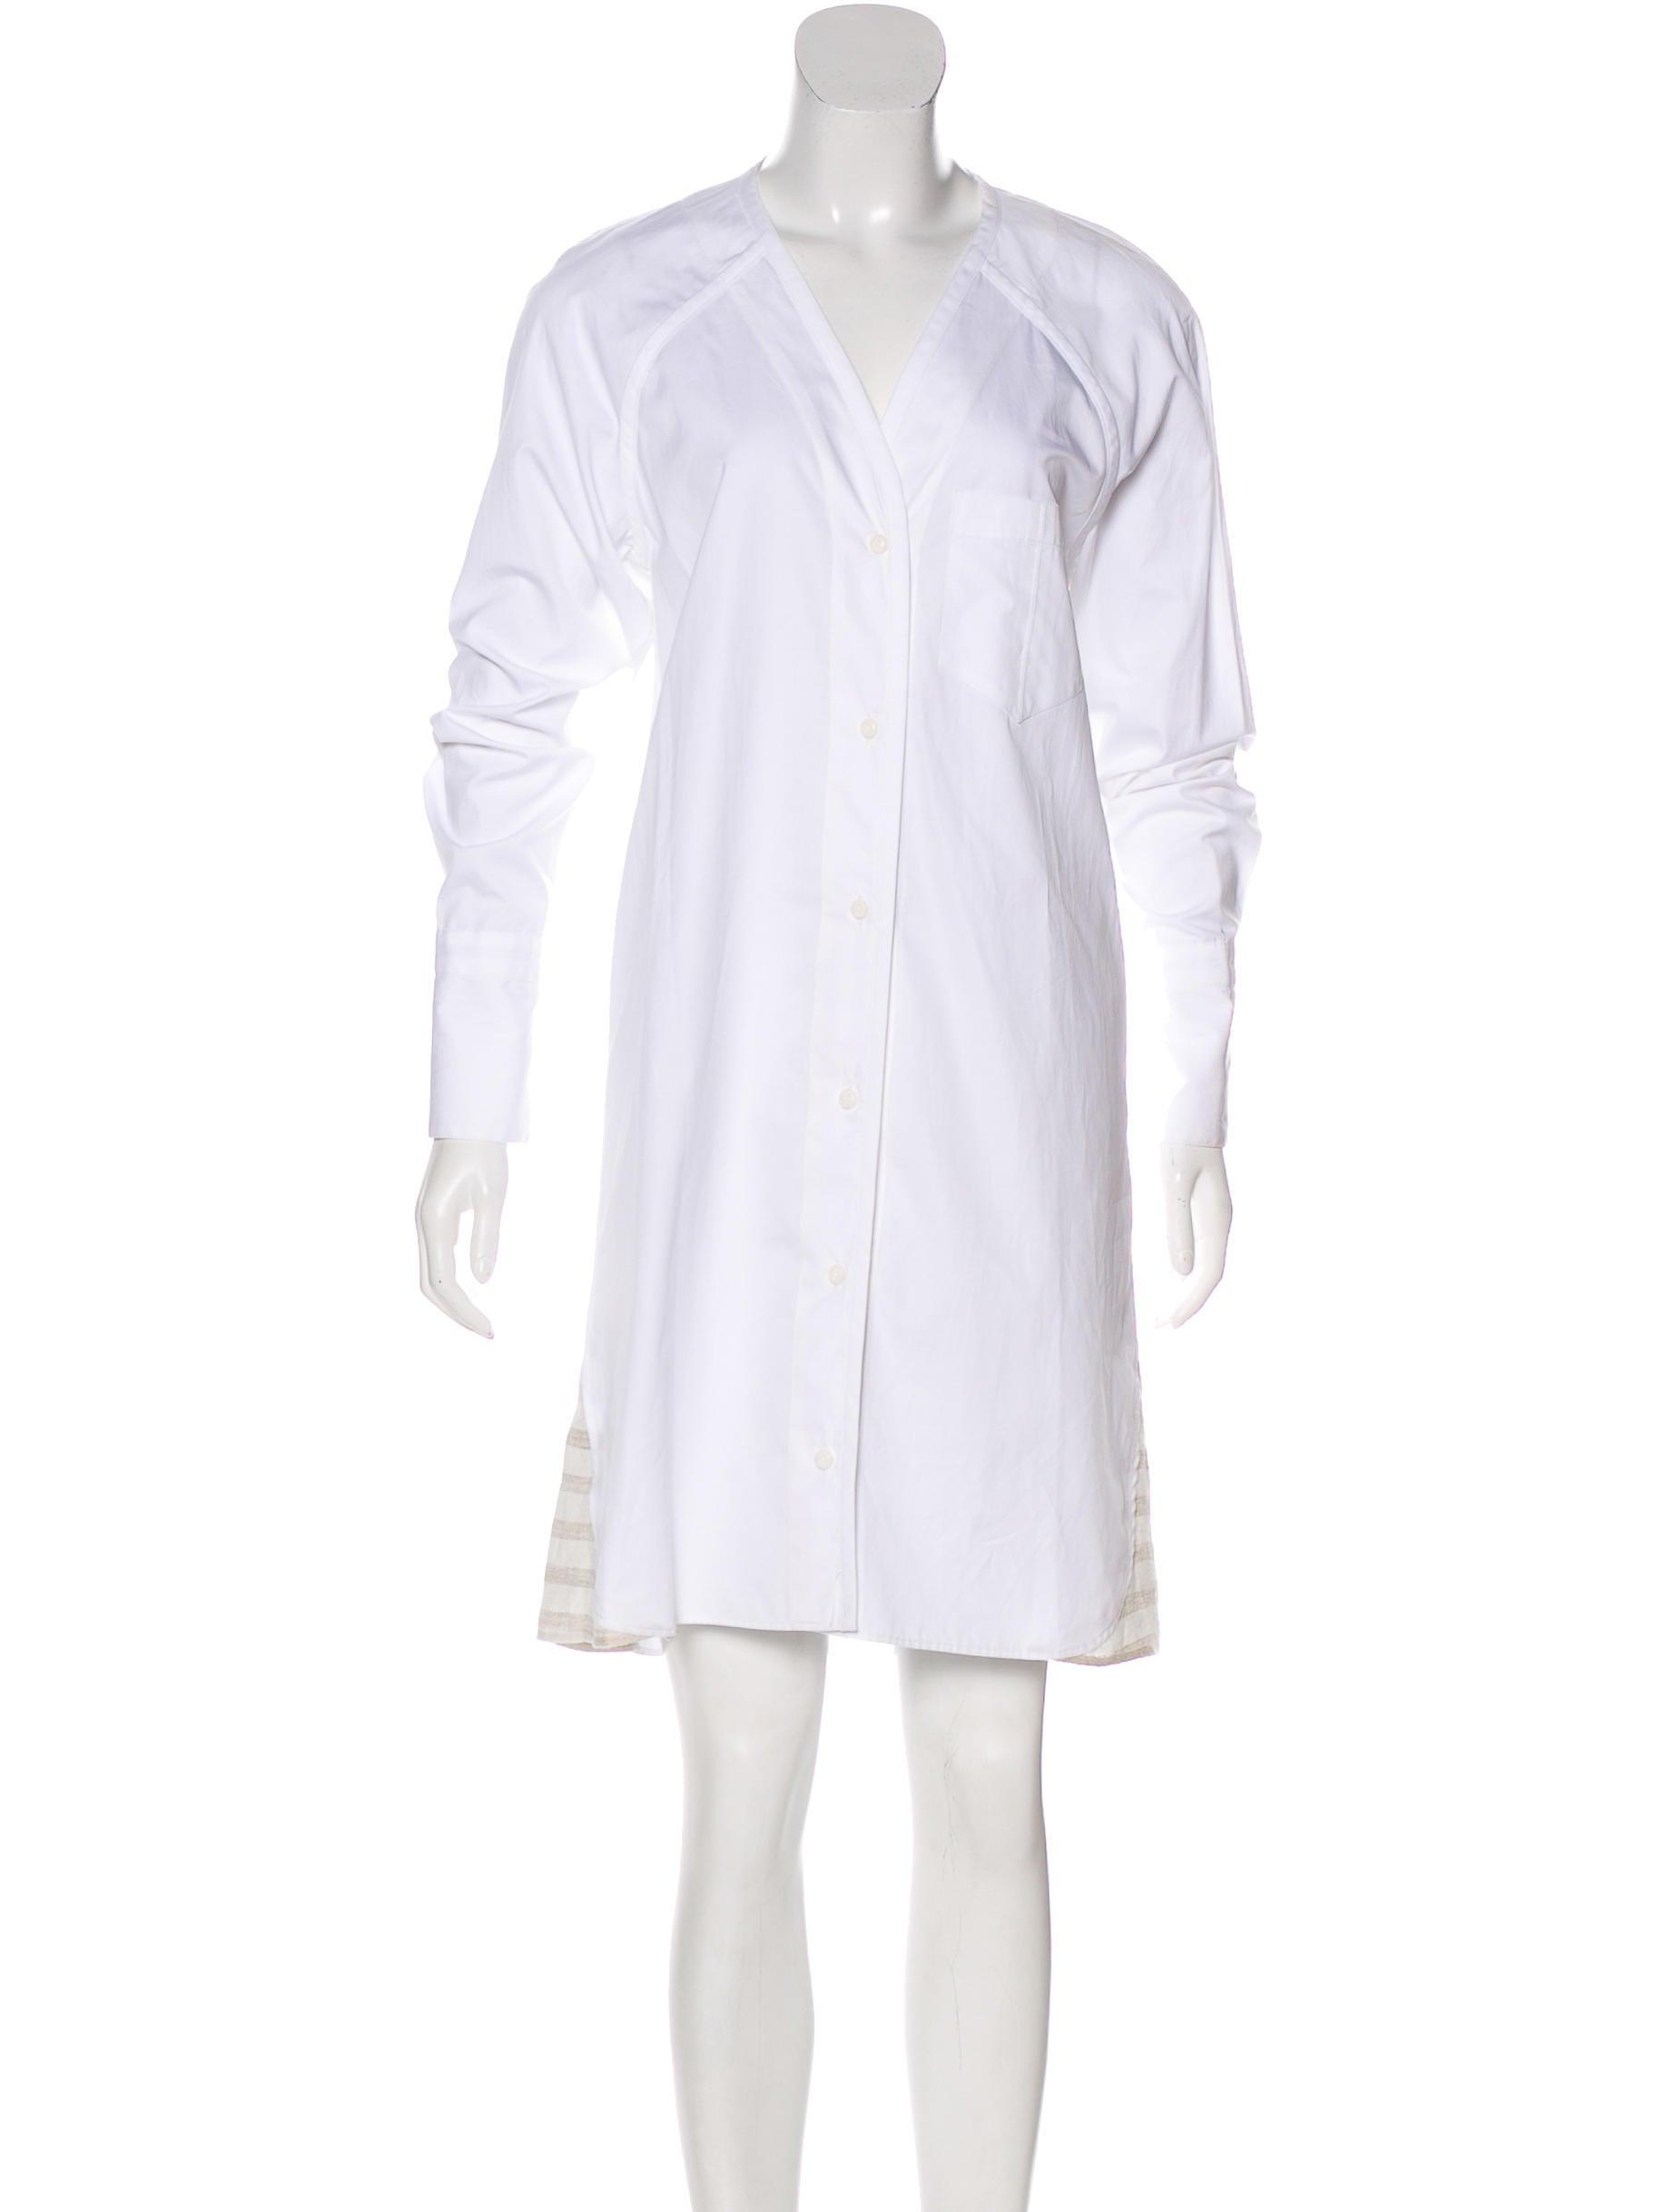 34811b32 Clothing | The RealReal